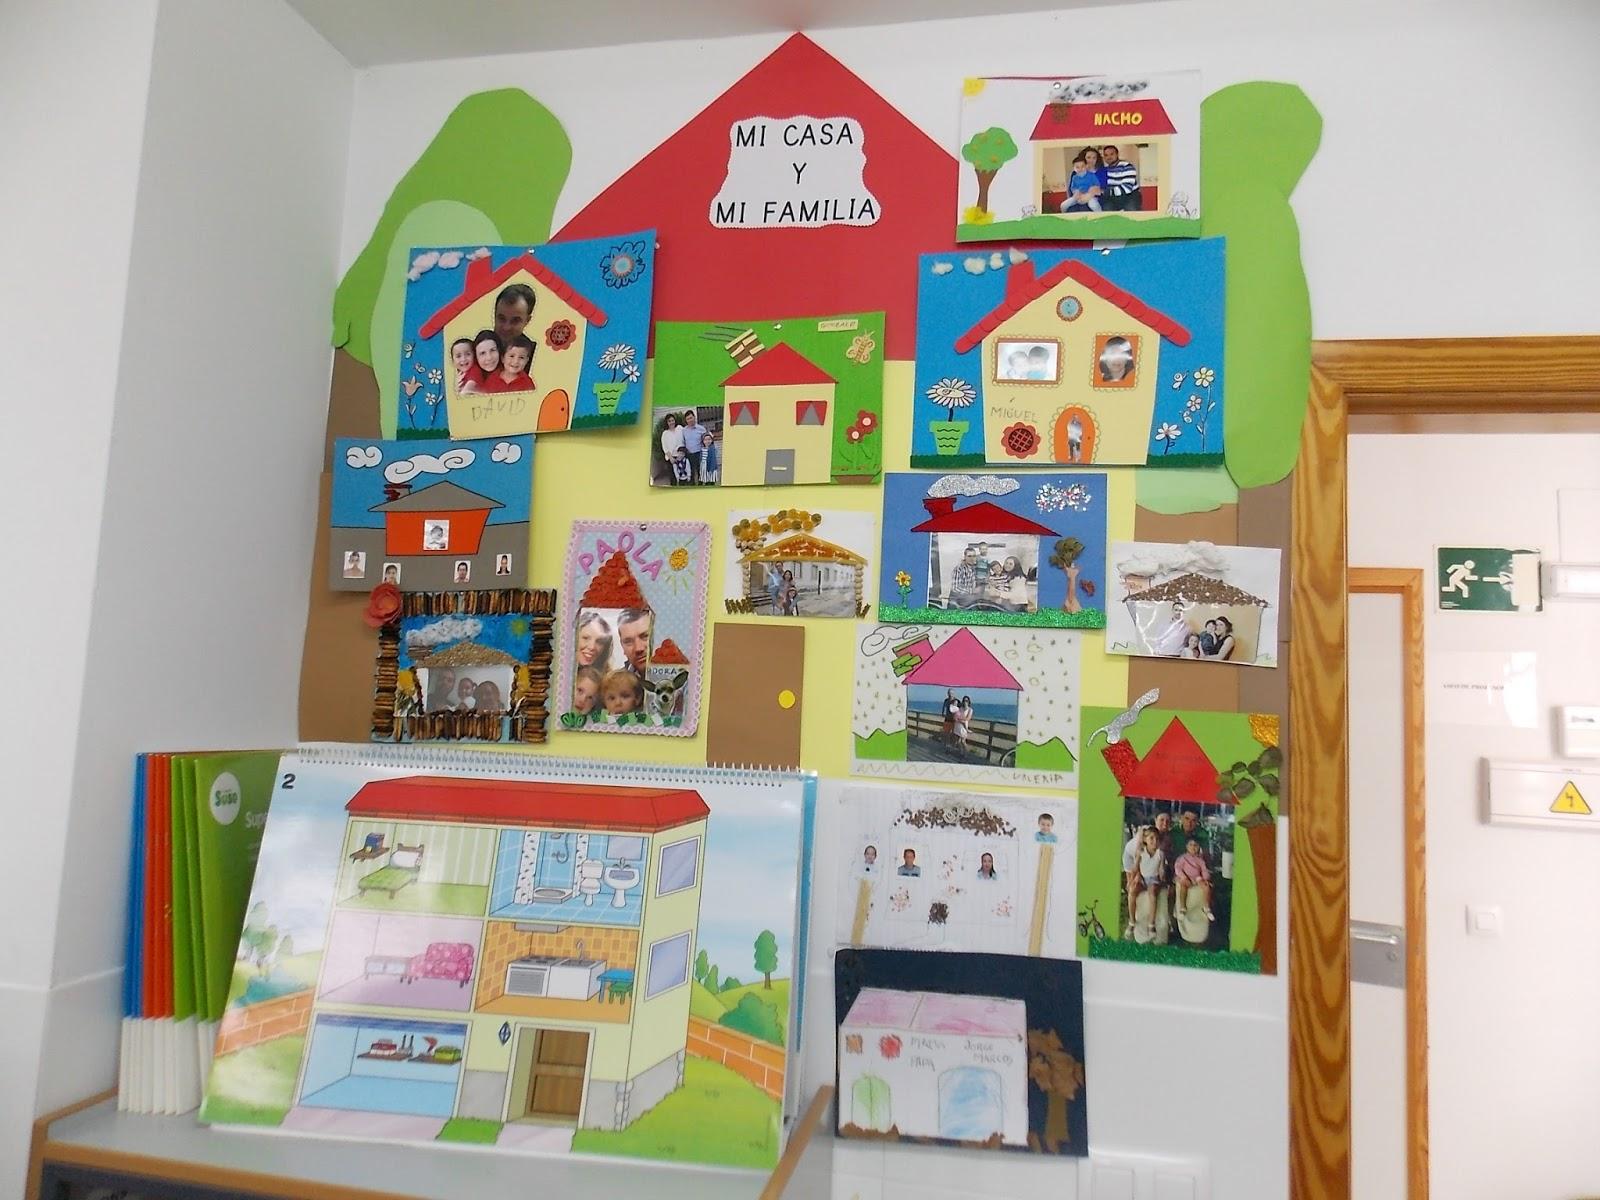 El cole de balboa la casa y la familia for Mural una familia chicana